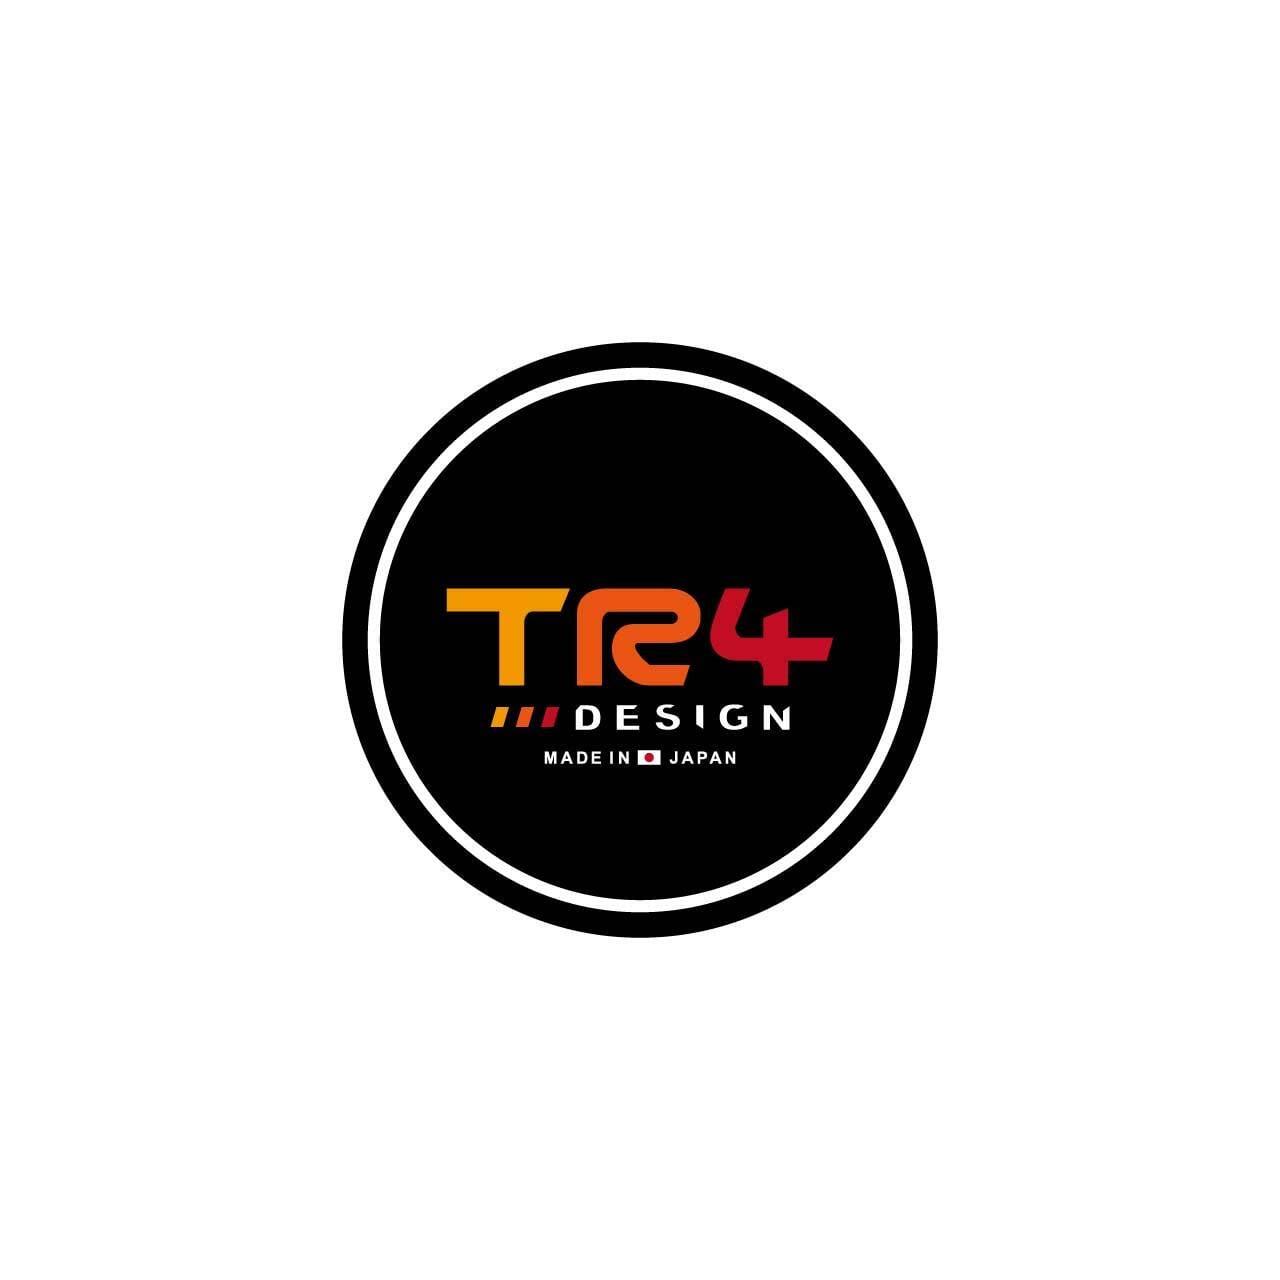 【 TR4Design 】TR4Design Sticker Decal #01